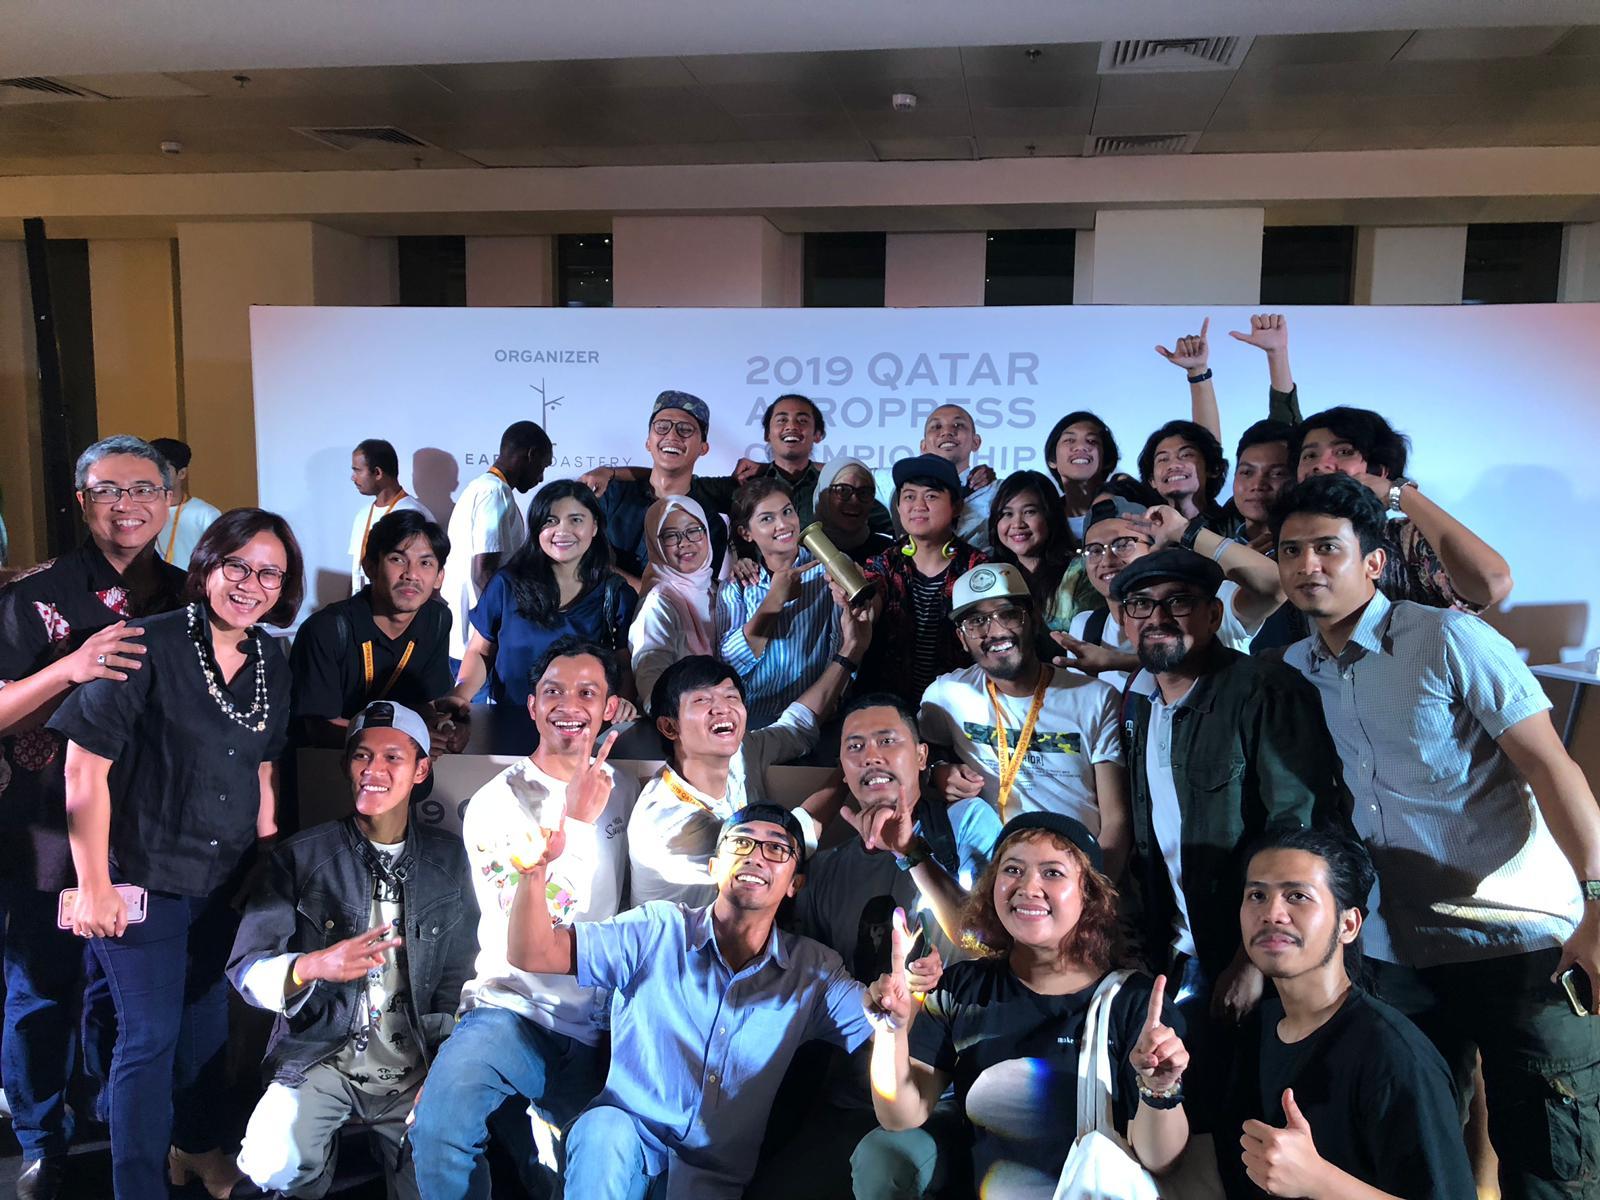 Barista Indonesia Juara Kompetisi Barista di Qatar